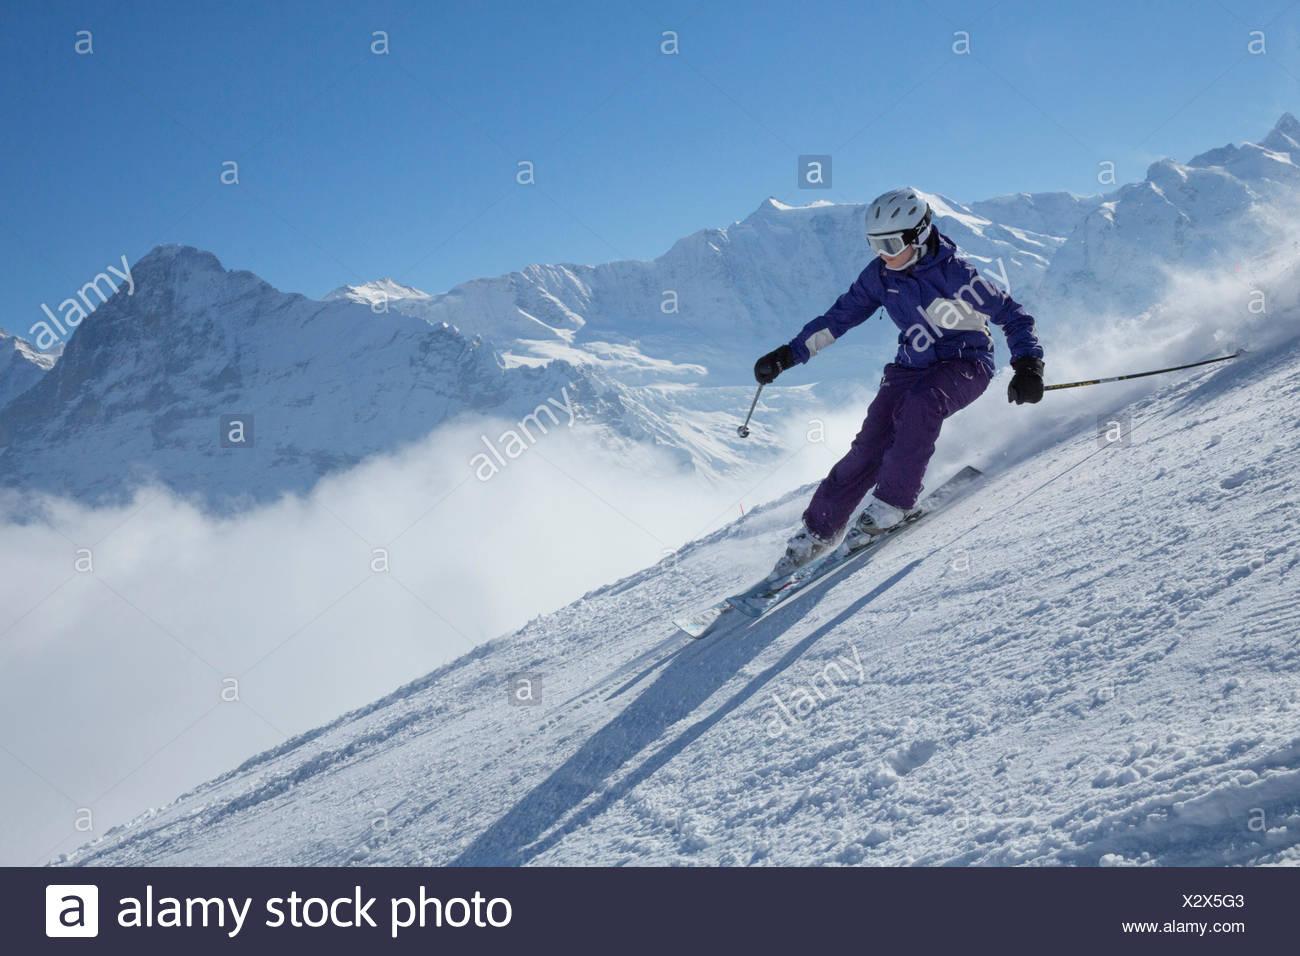 Ski, Skifahren, Grindelwald, Grat, Eiger, Jungfrau, Berg, Berge, Ski, Skifahren, Carving, Winter, Wintersport, Kanton Bern, Stockbild